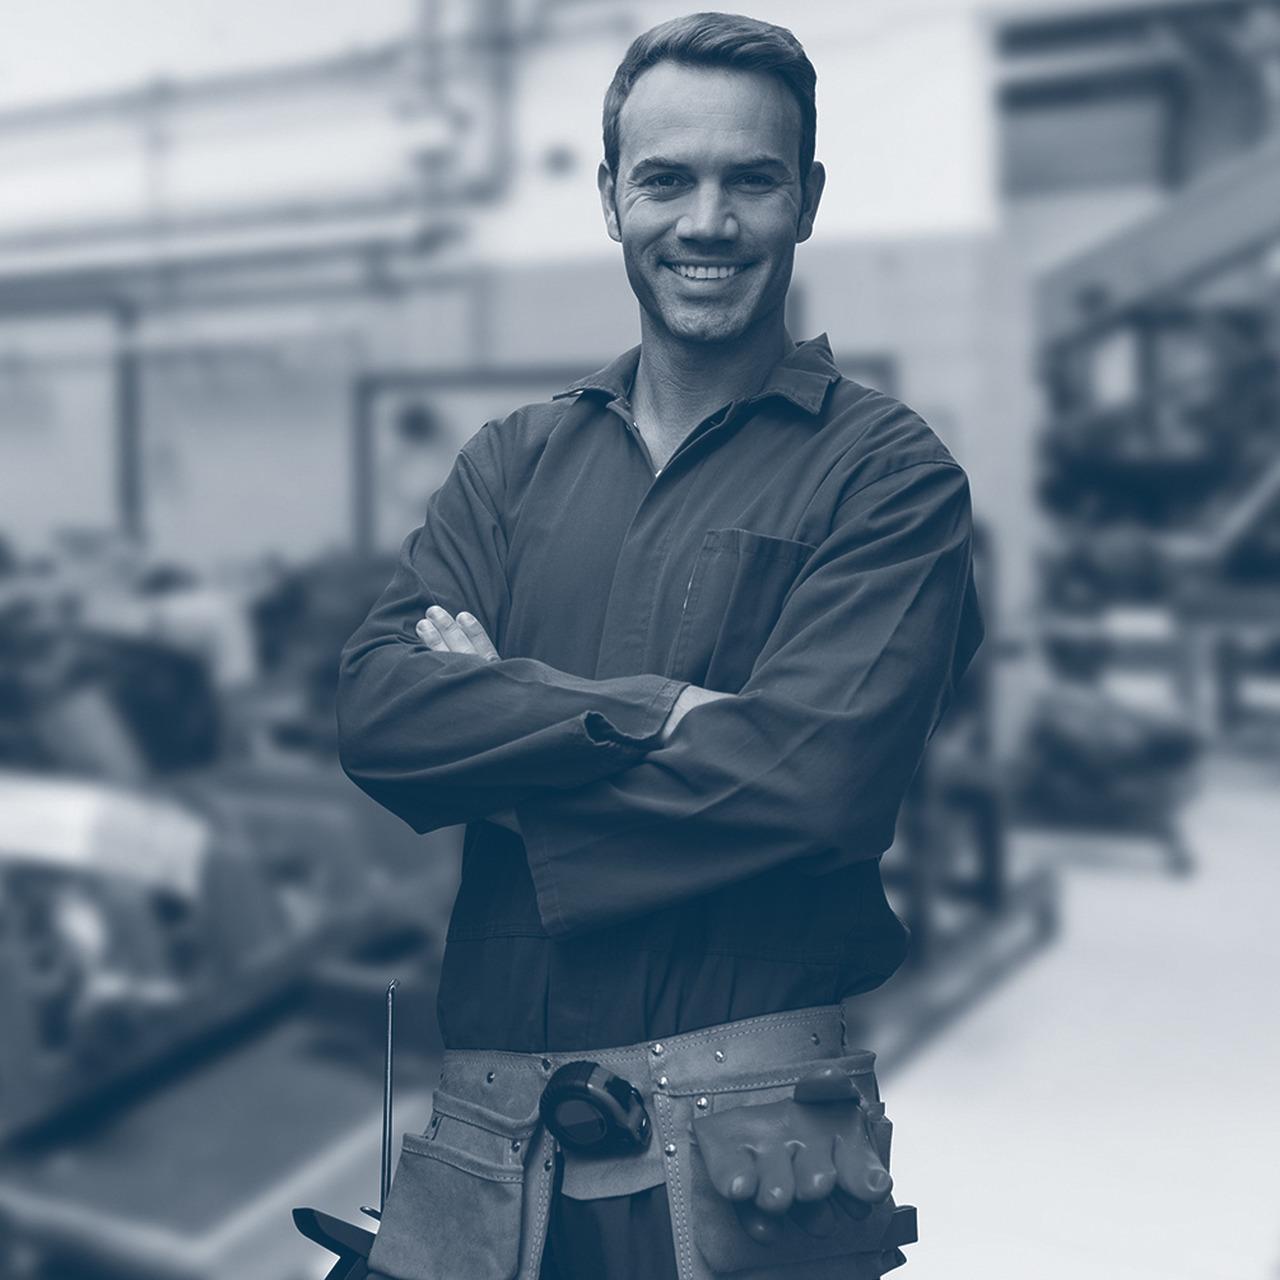 4 industrial electricians